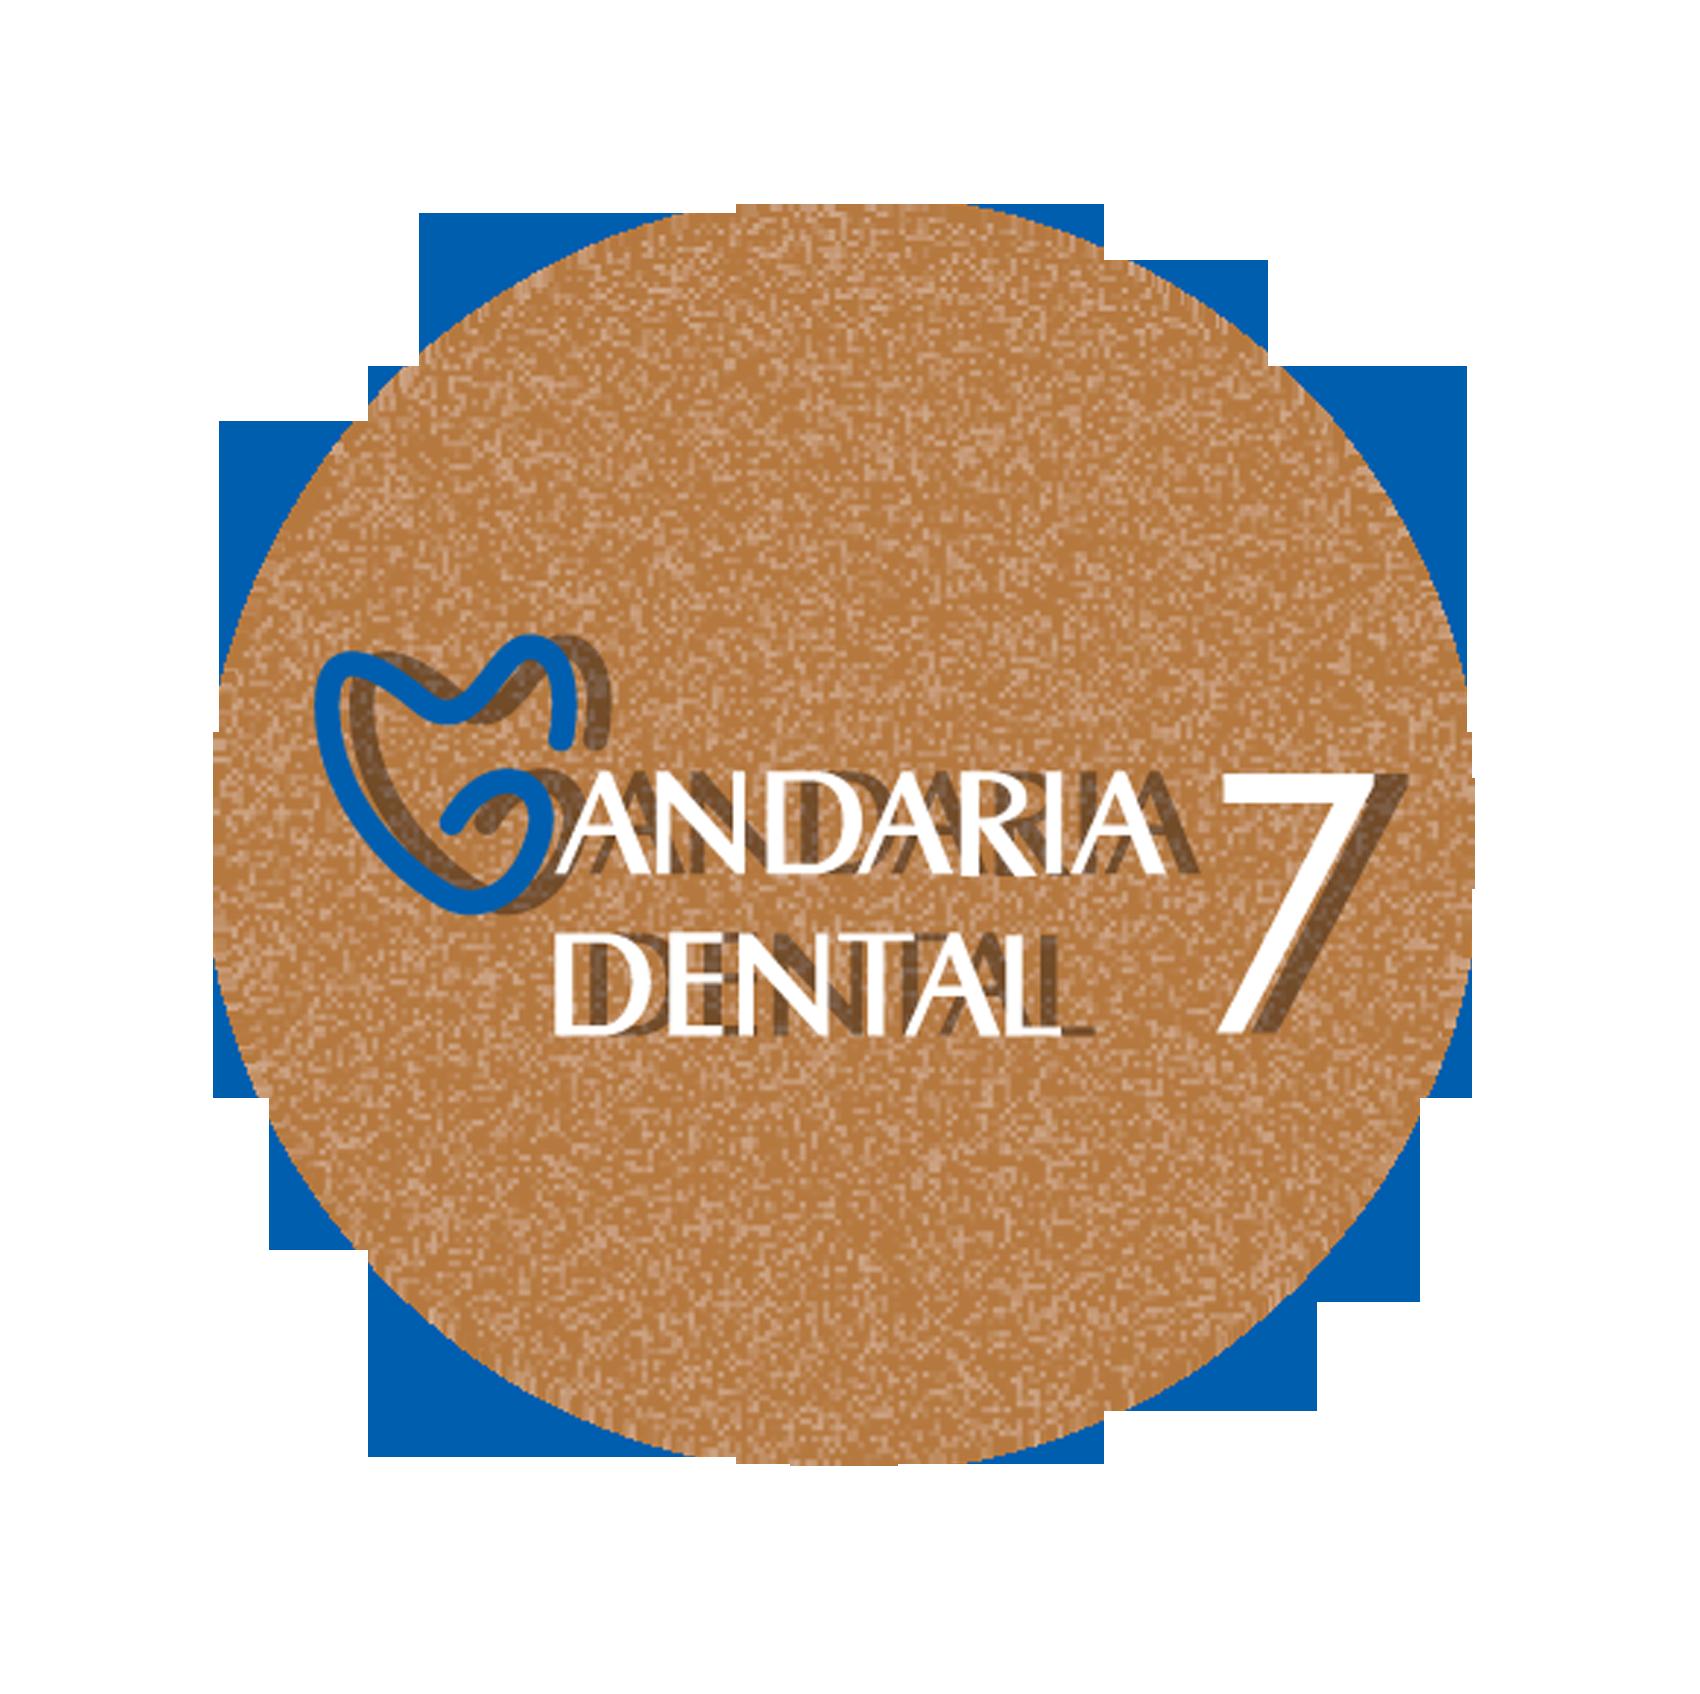 Gandaria Dental 7